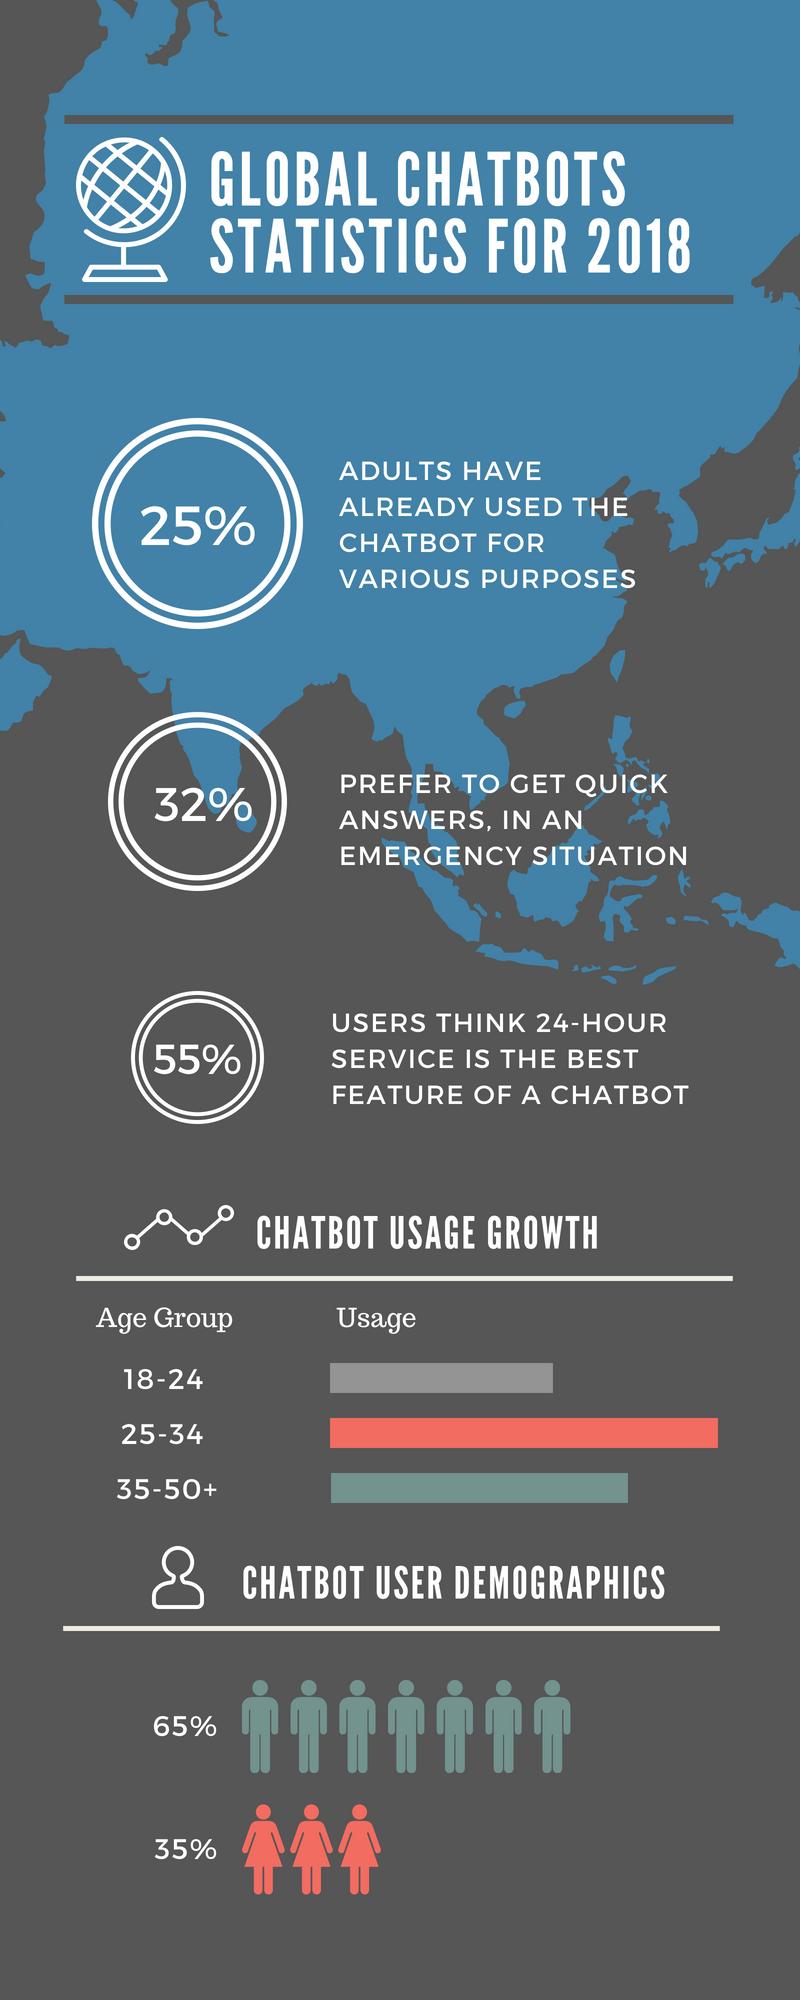 Global chatbot statistics for 2018